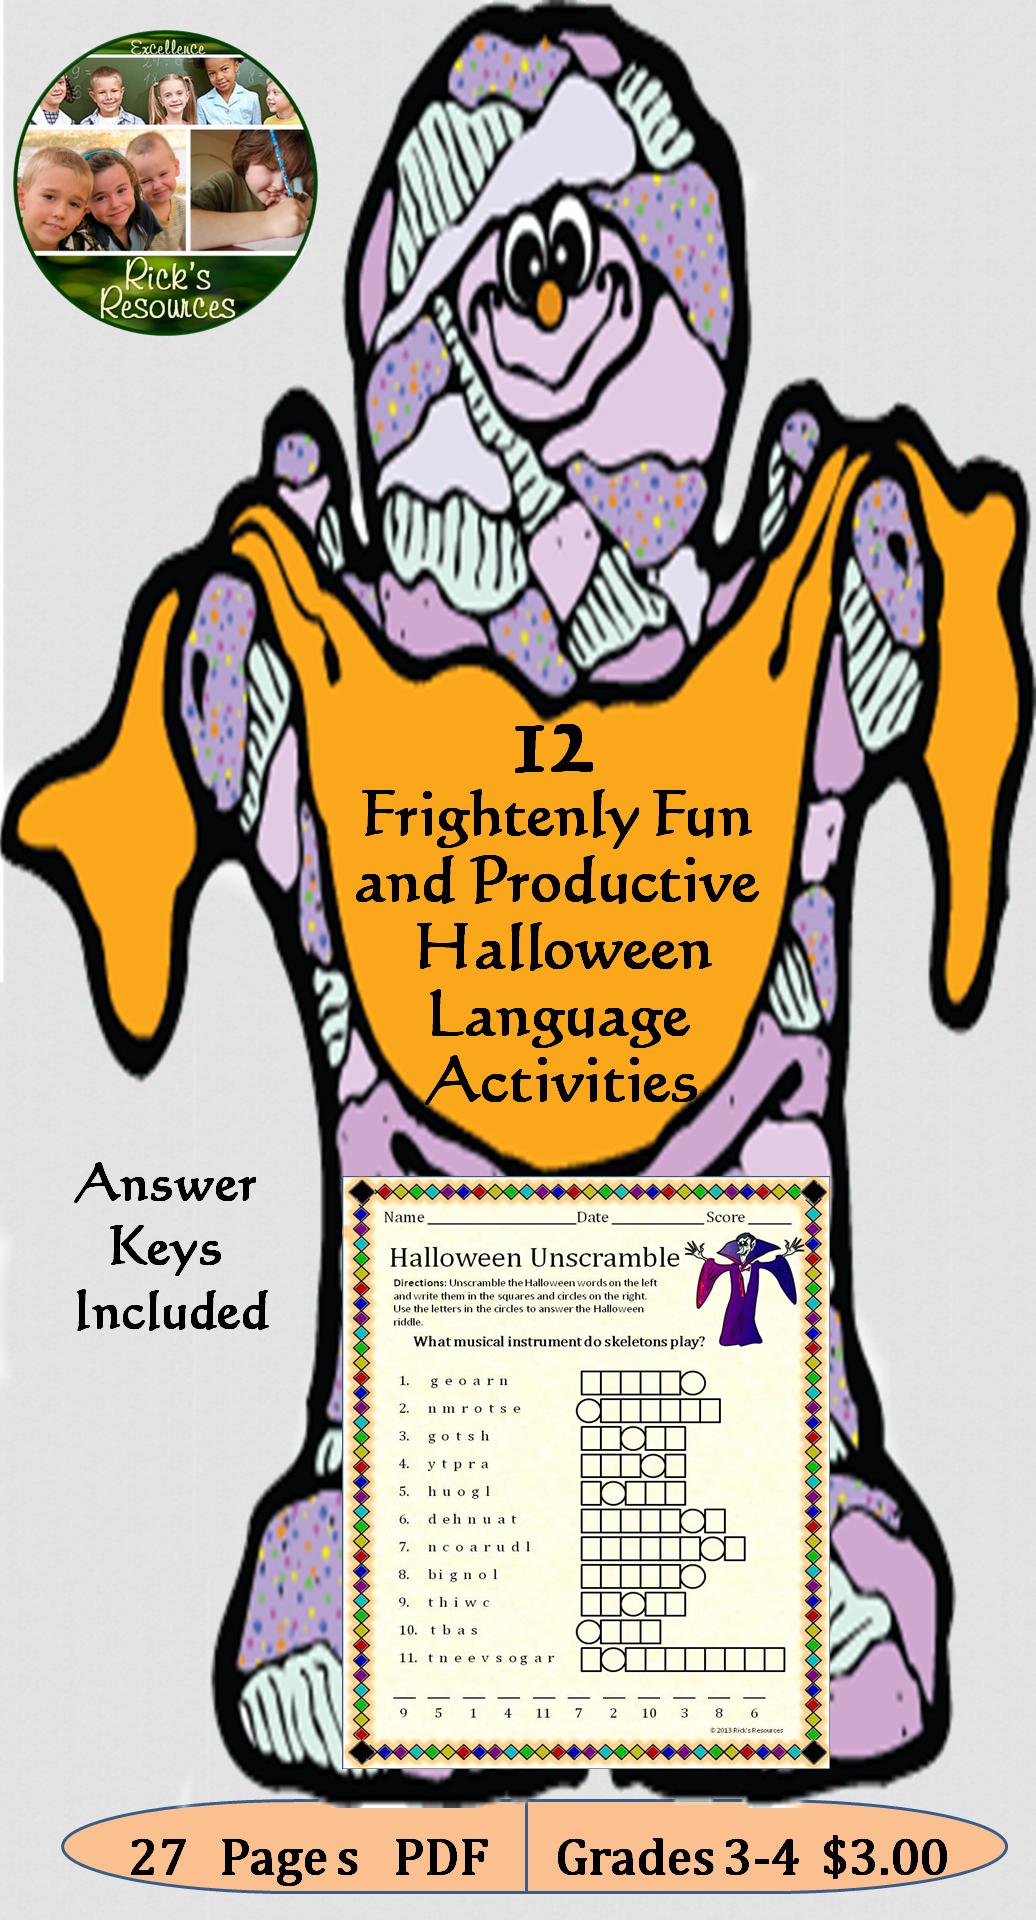 Halloween Language Activities (With images) Language